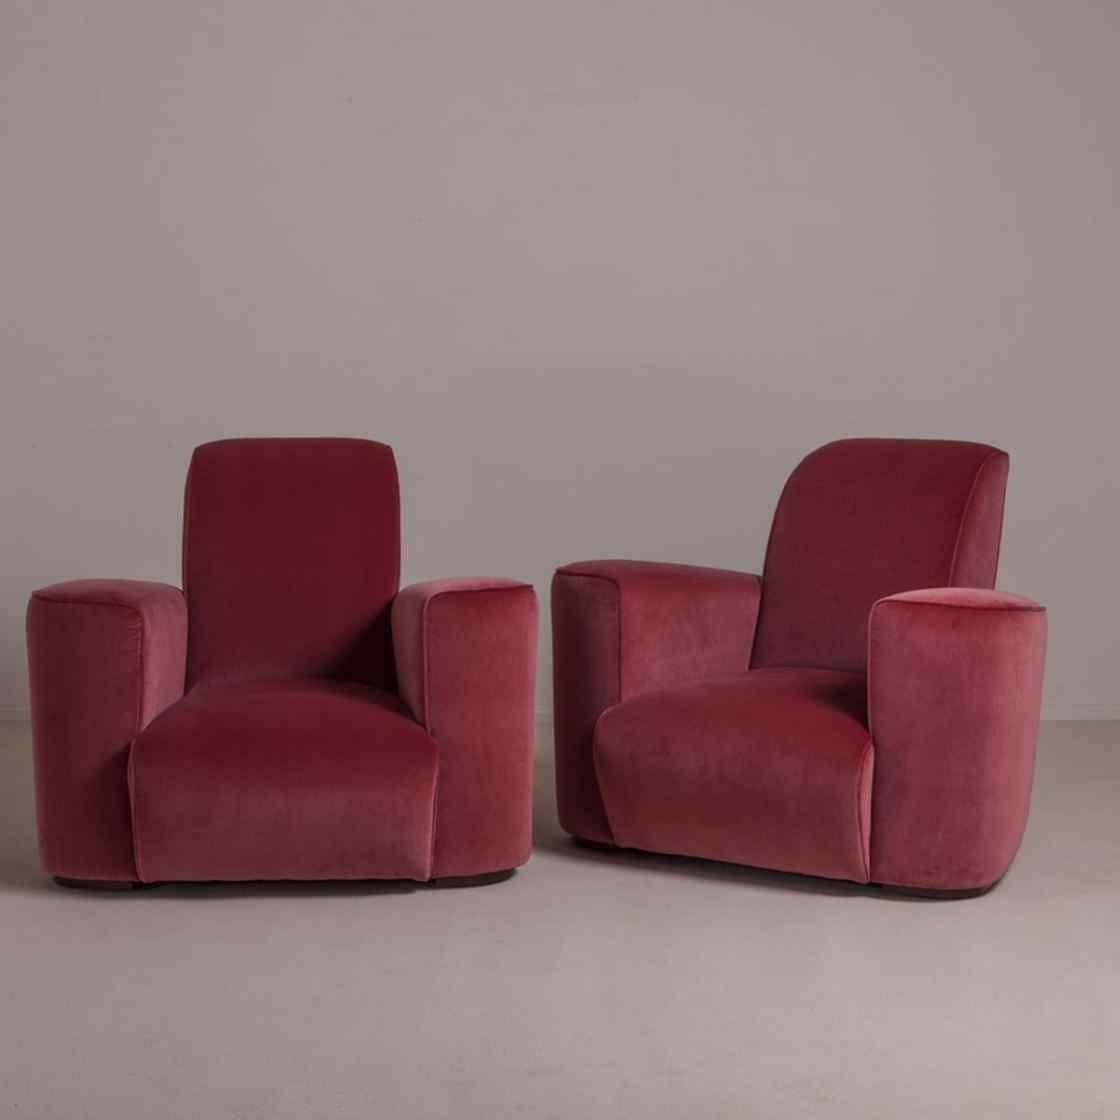 The Deco Club Chairs by Talisman Bespoke | Talisman